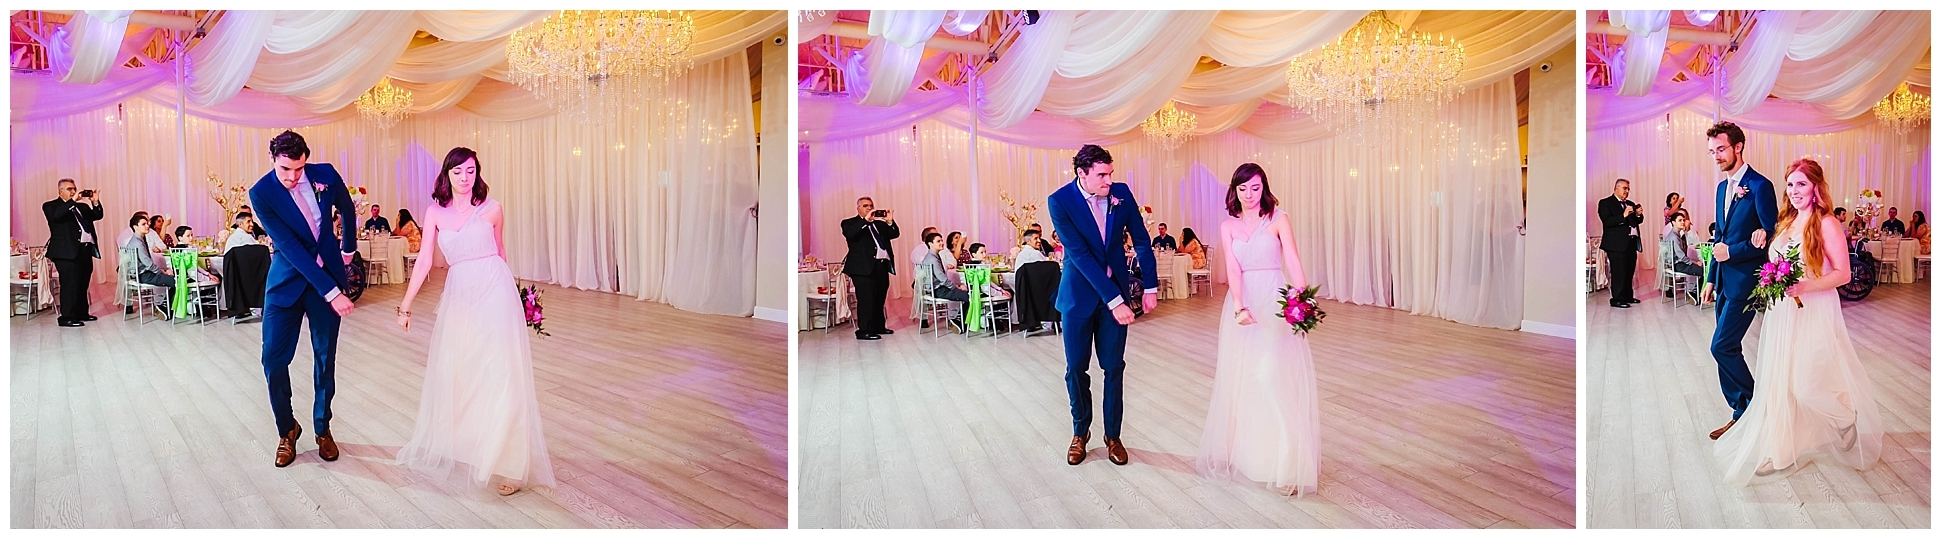 st-pete-wedding-photographer-sunken-gardens-crystal-ballroom-princess-dancer_0185.jpg